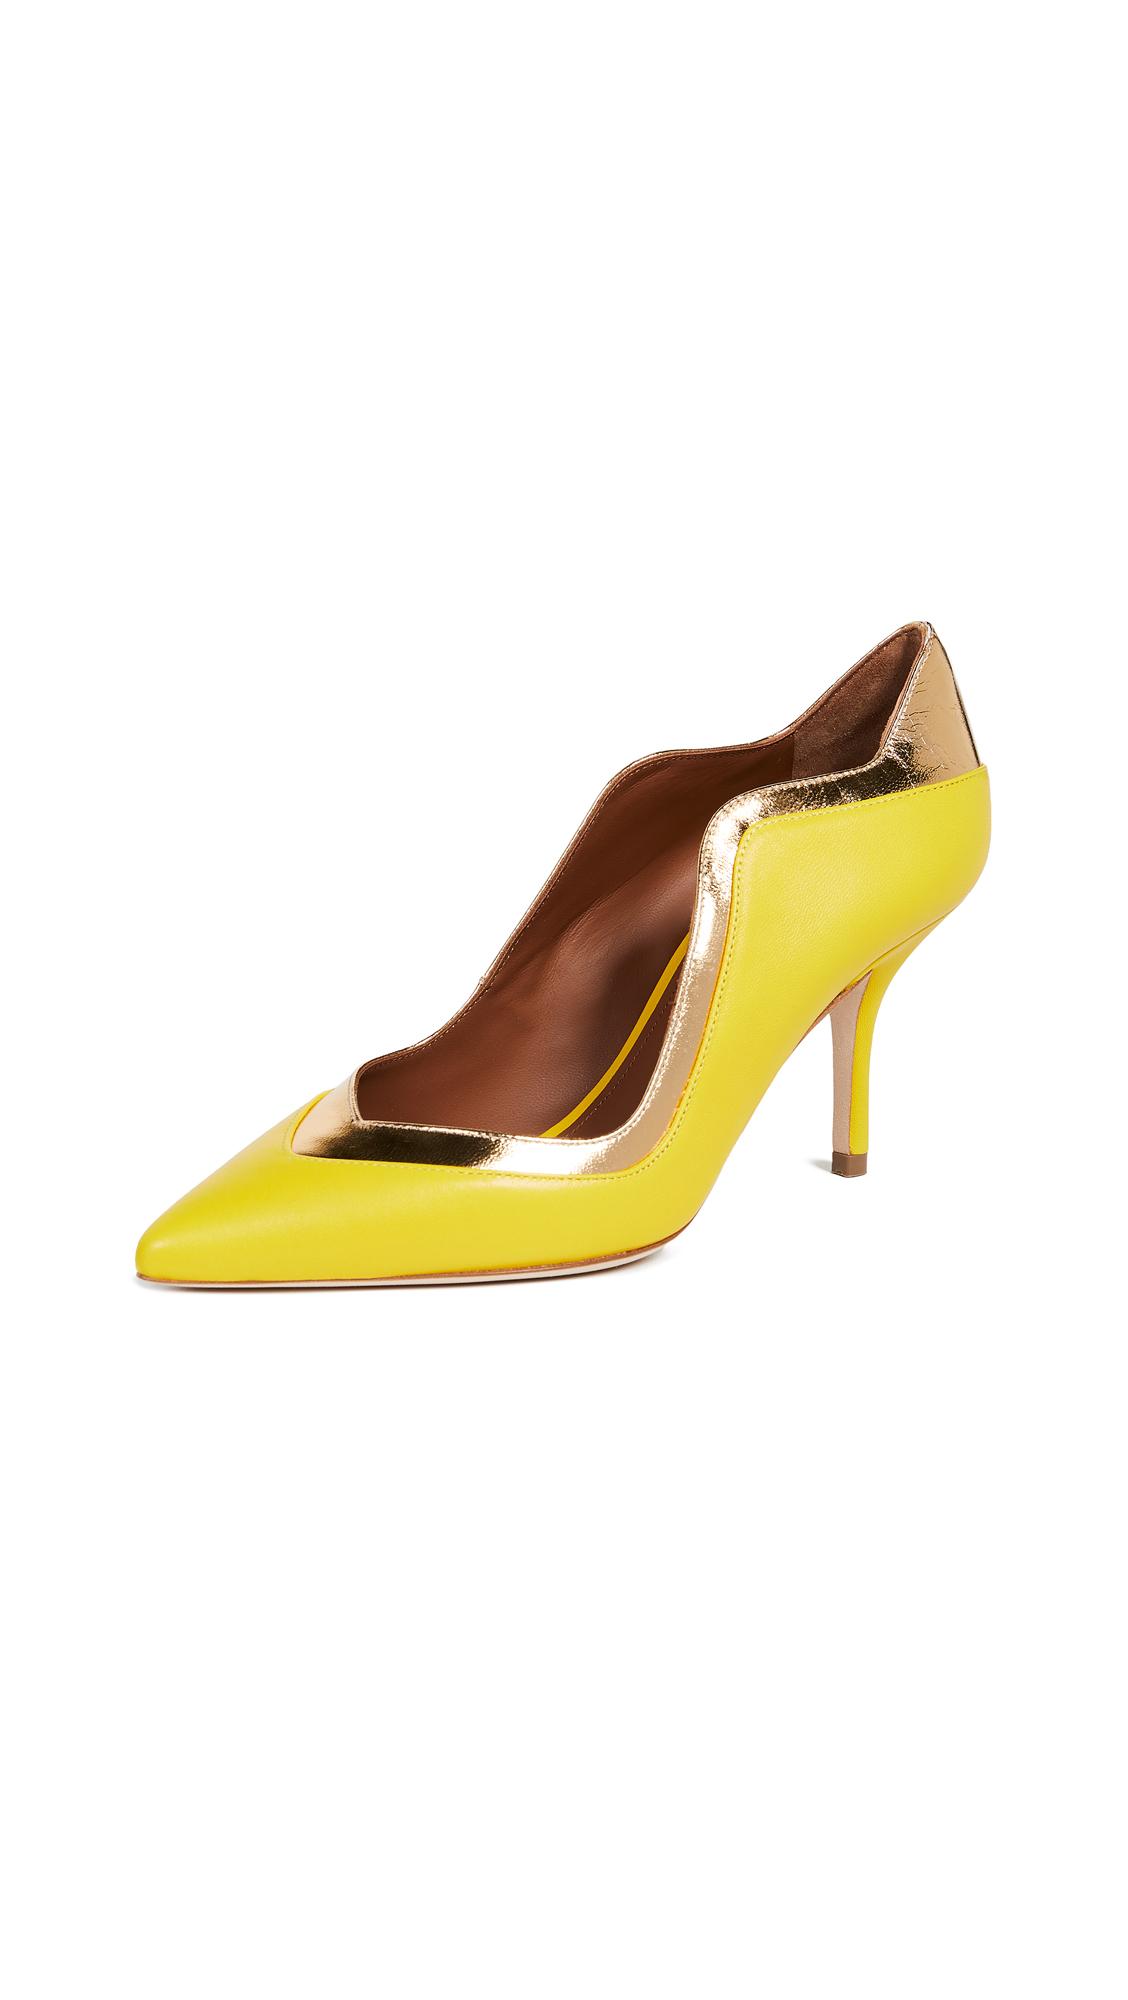 Malone Souliers Penelope 70 Pumps - Yellow/Gold